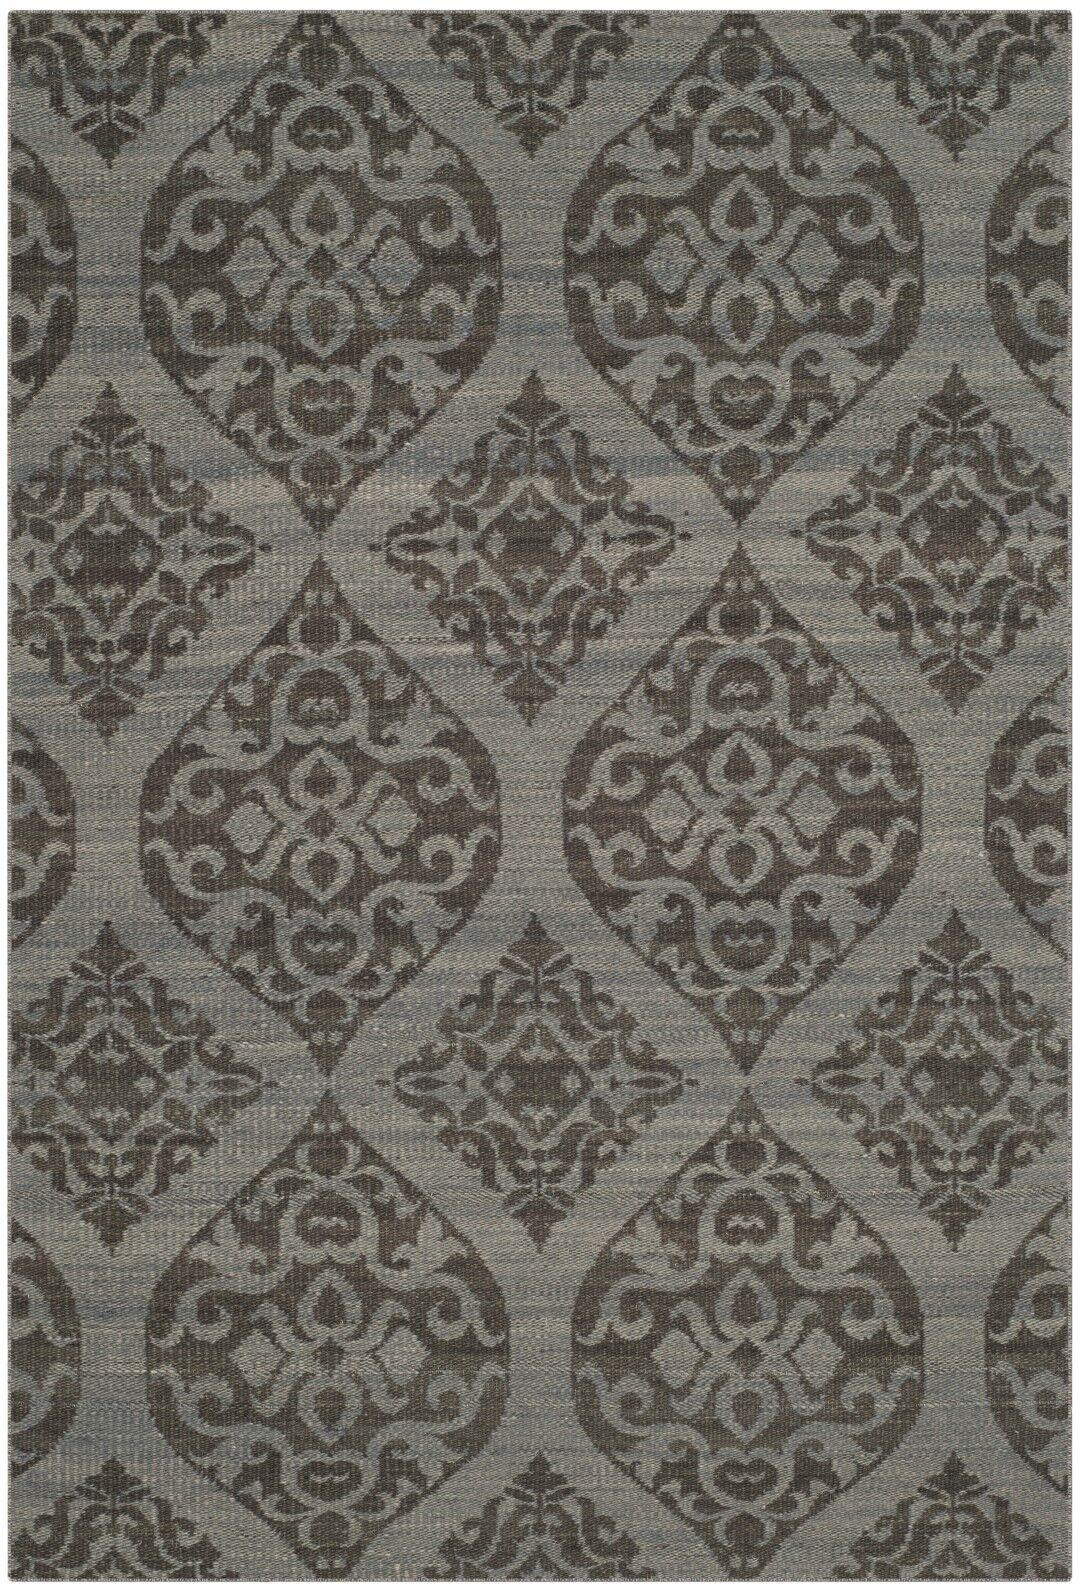 Jacobson Hand-Woven Dark Gray Area Rug Rug Size: Rectangle 4' x 6'